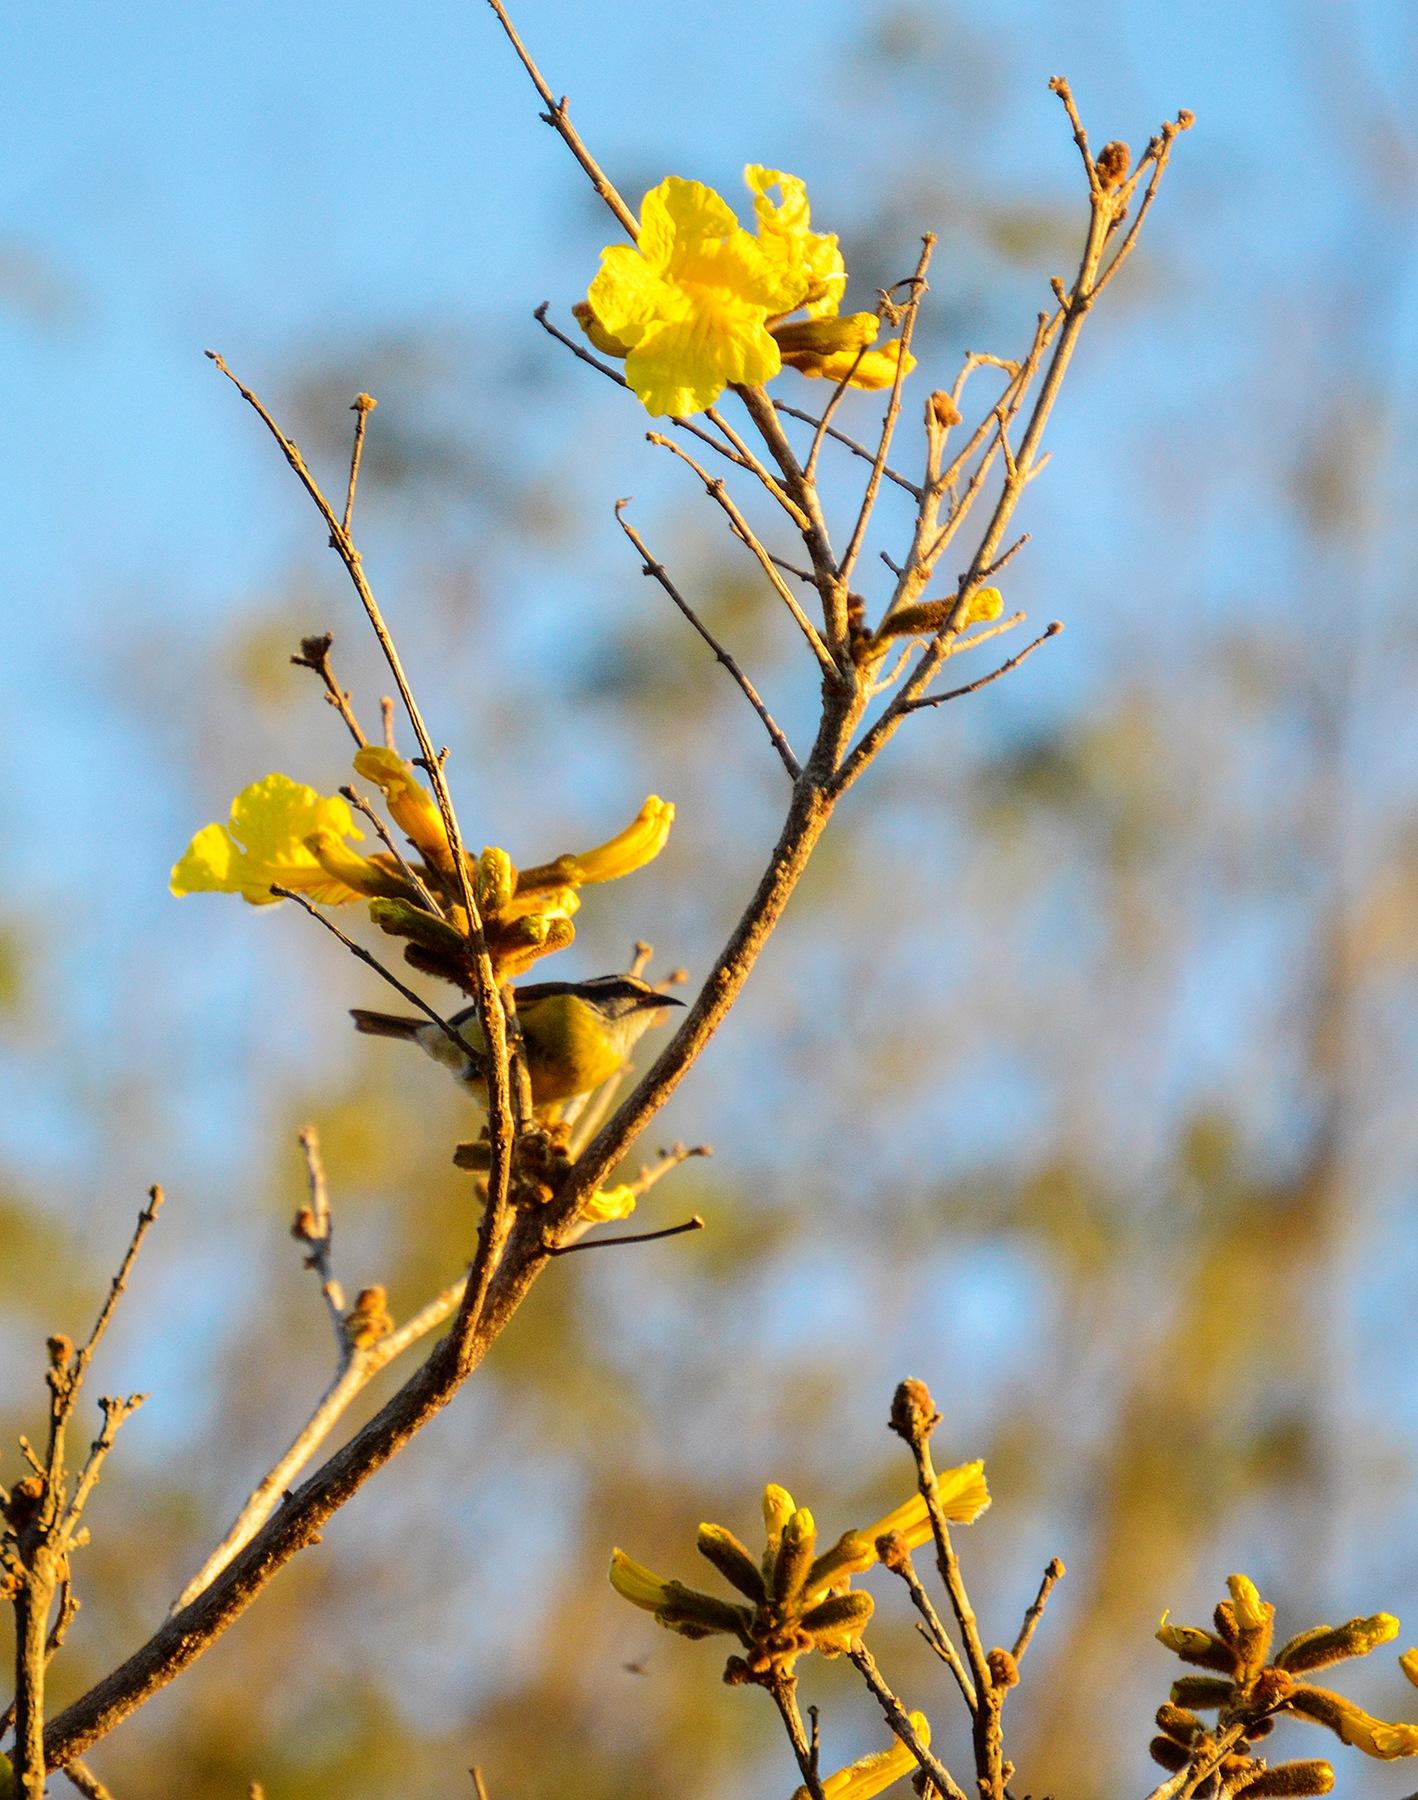 Cerrado Flower by Luiz Caju